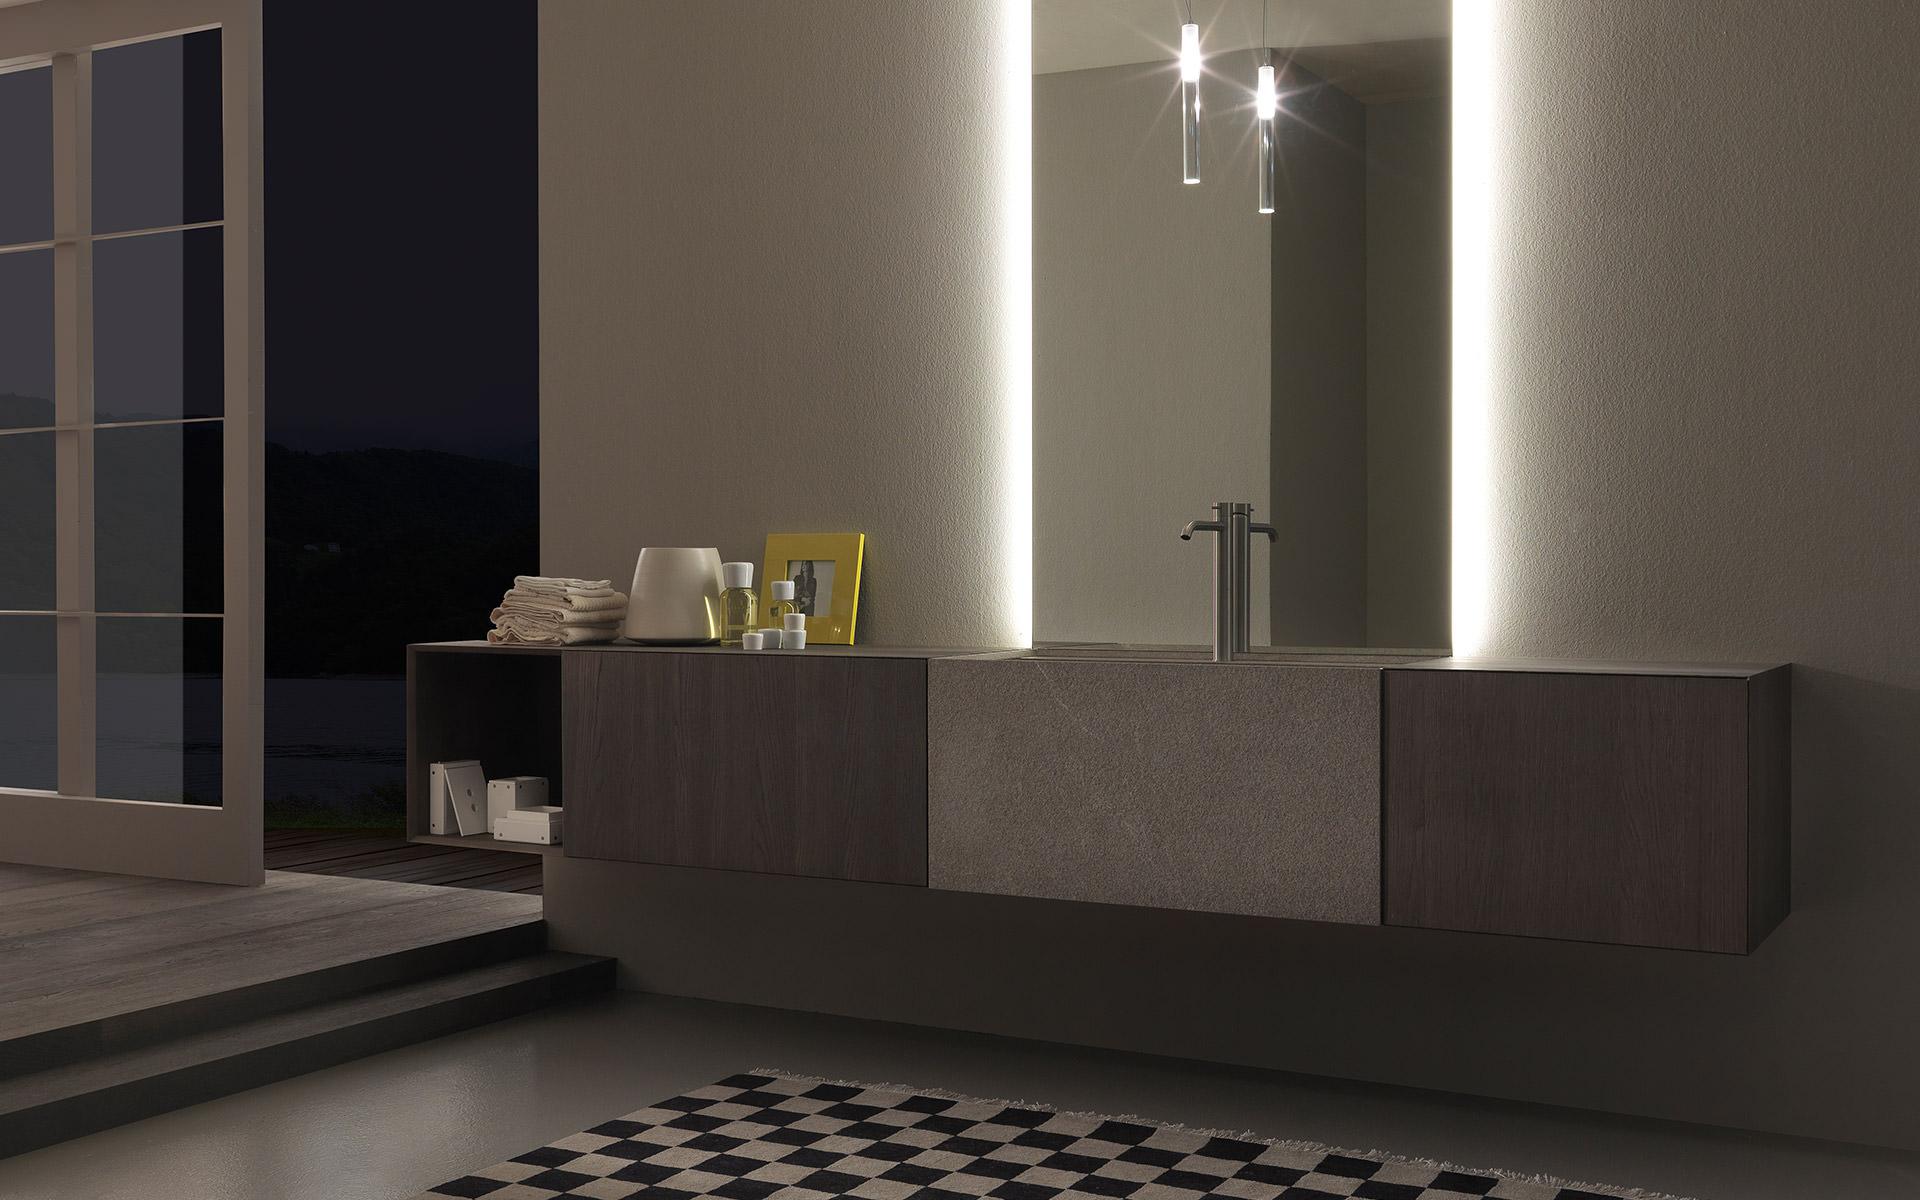 Meuble salle de bain marque italienne destockage meuble for Meuble salle de bain italienne